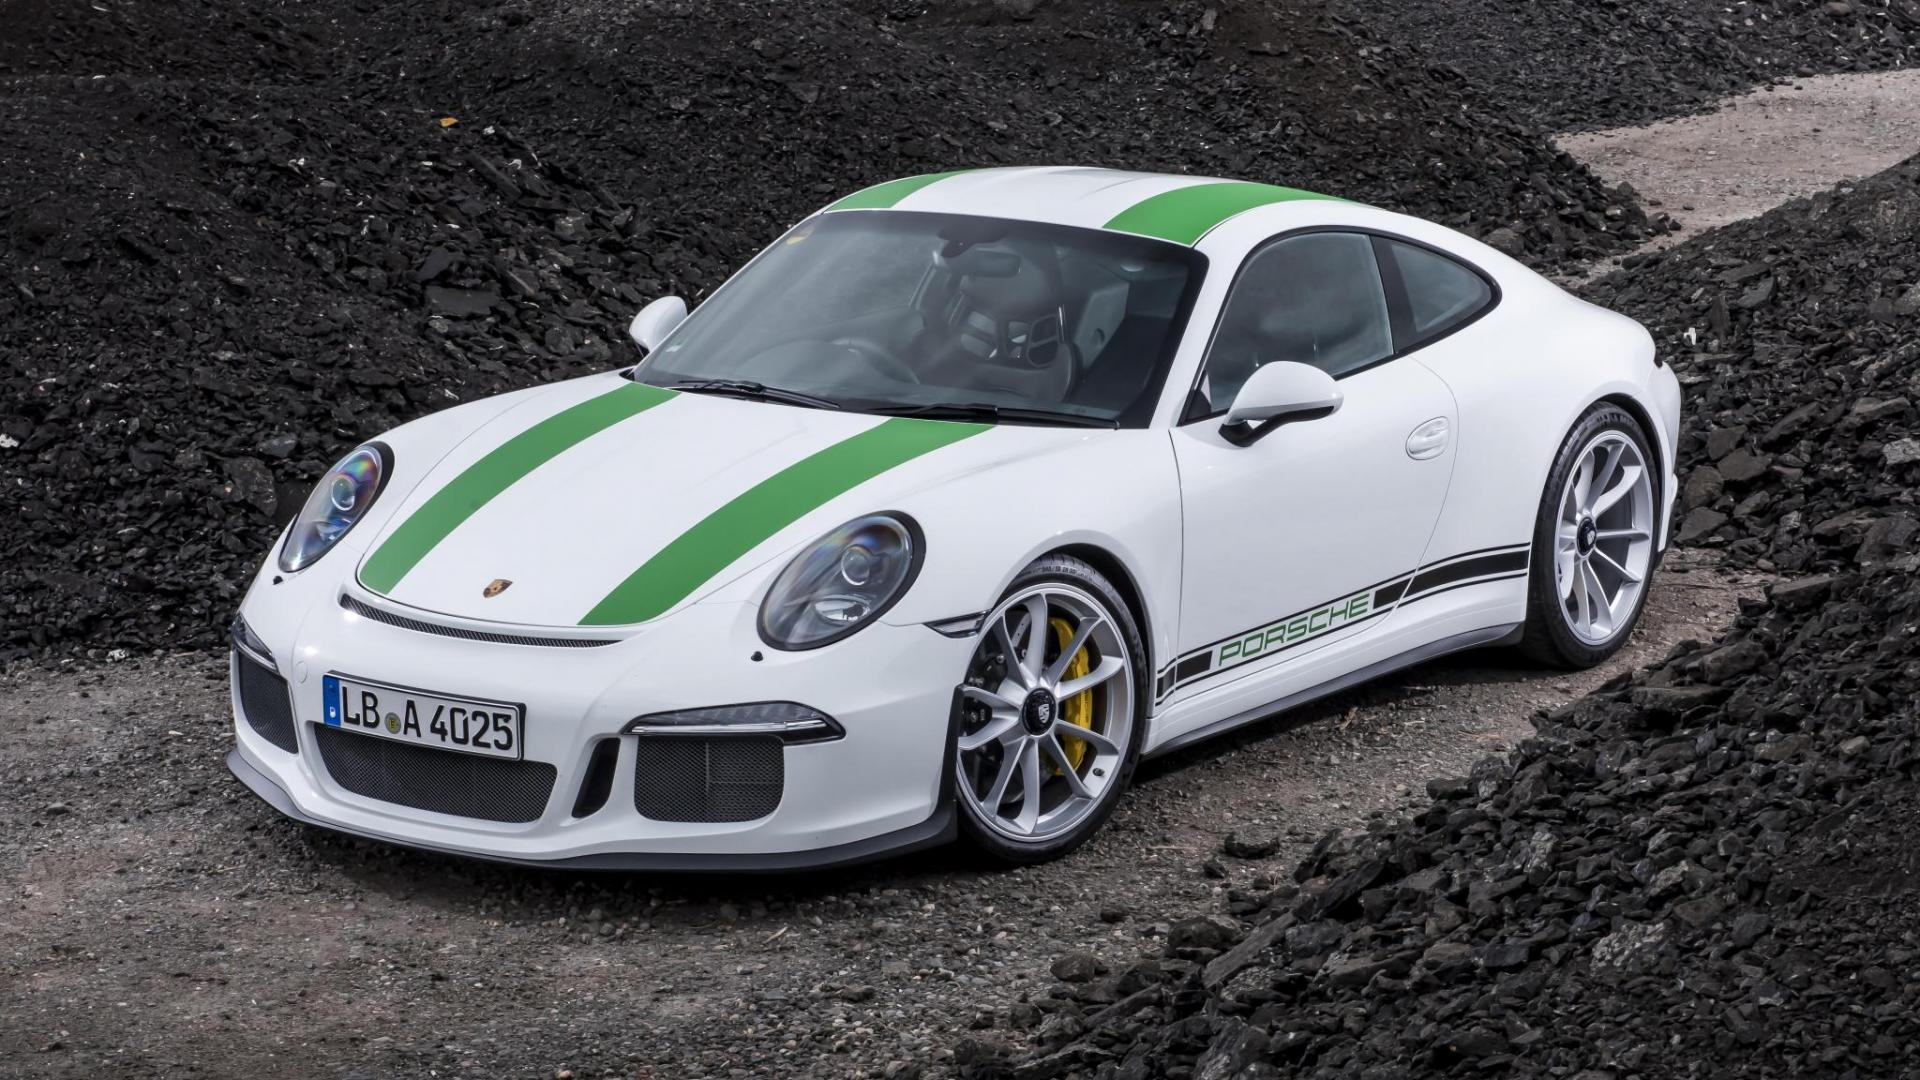 Porsche 911 R of Singer 911 Welke pure rijmachine kies jij 1920x1080